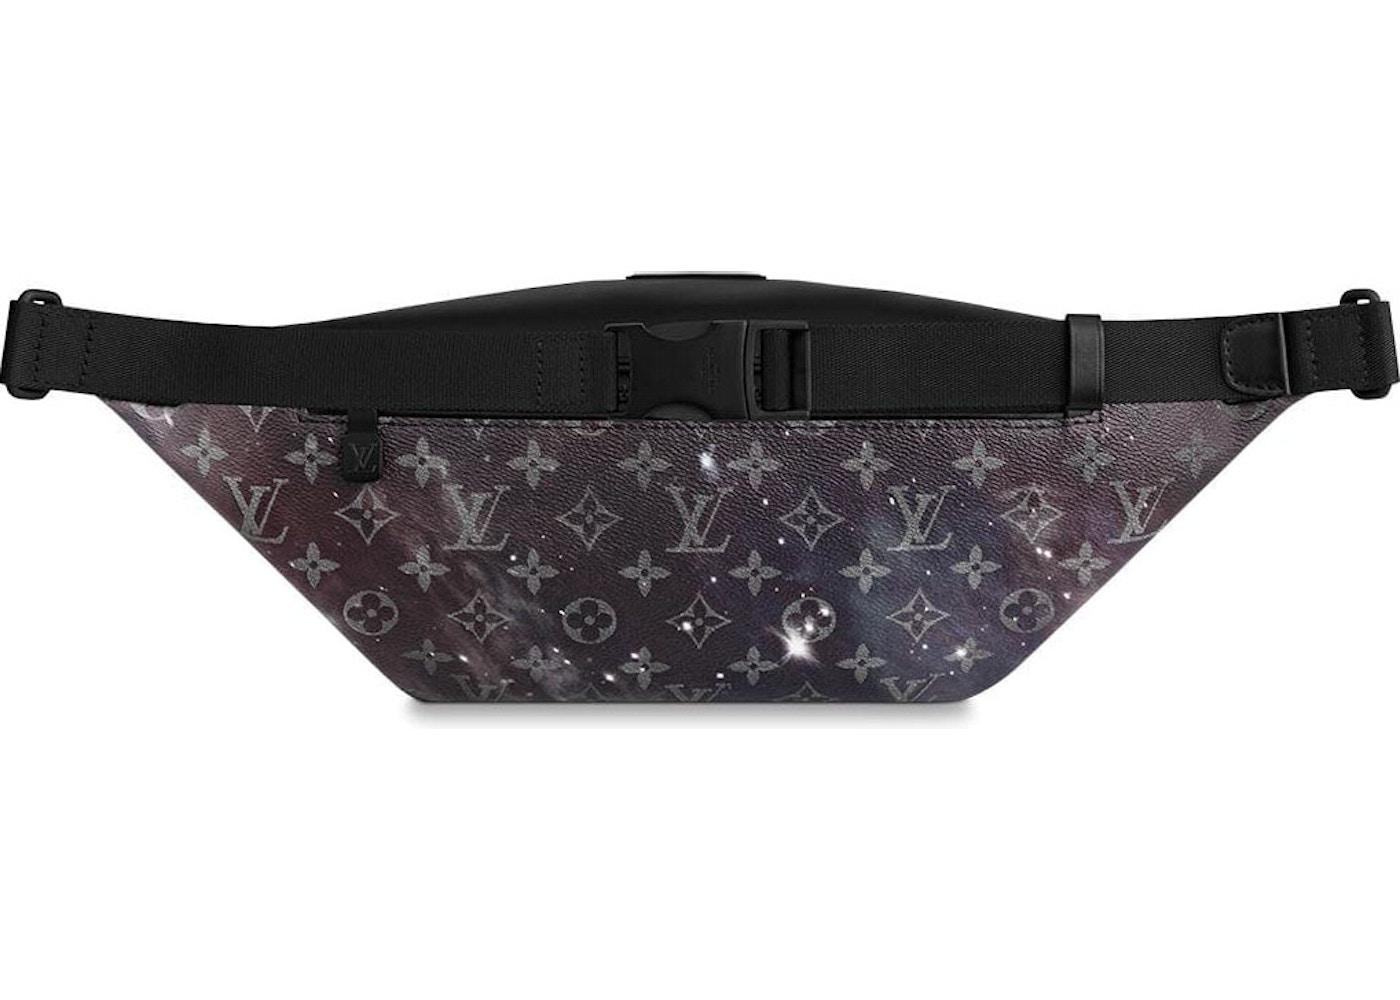 cb99ffc90b43e Louis Vuitton Discovery Bumbag Monogram Galaxy Black Multicolor